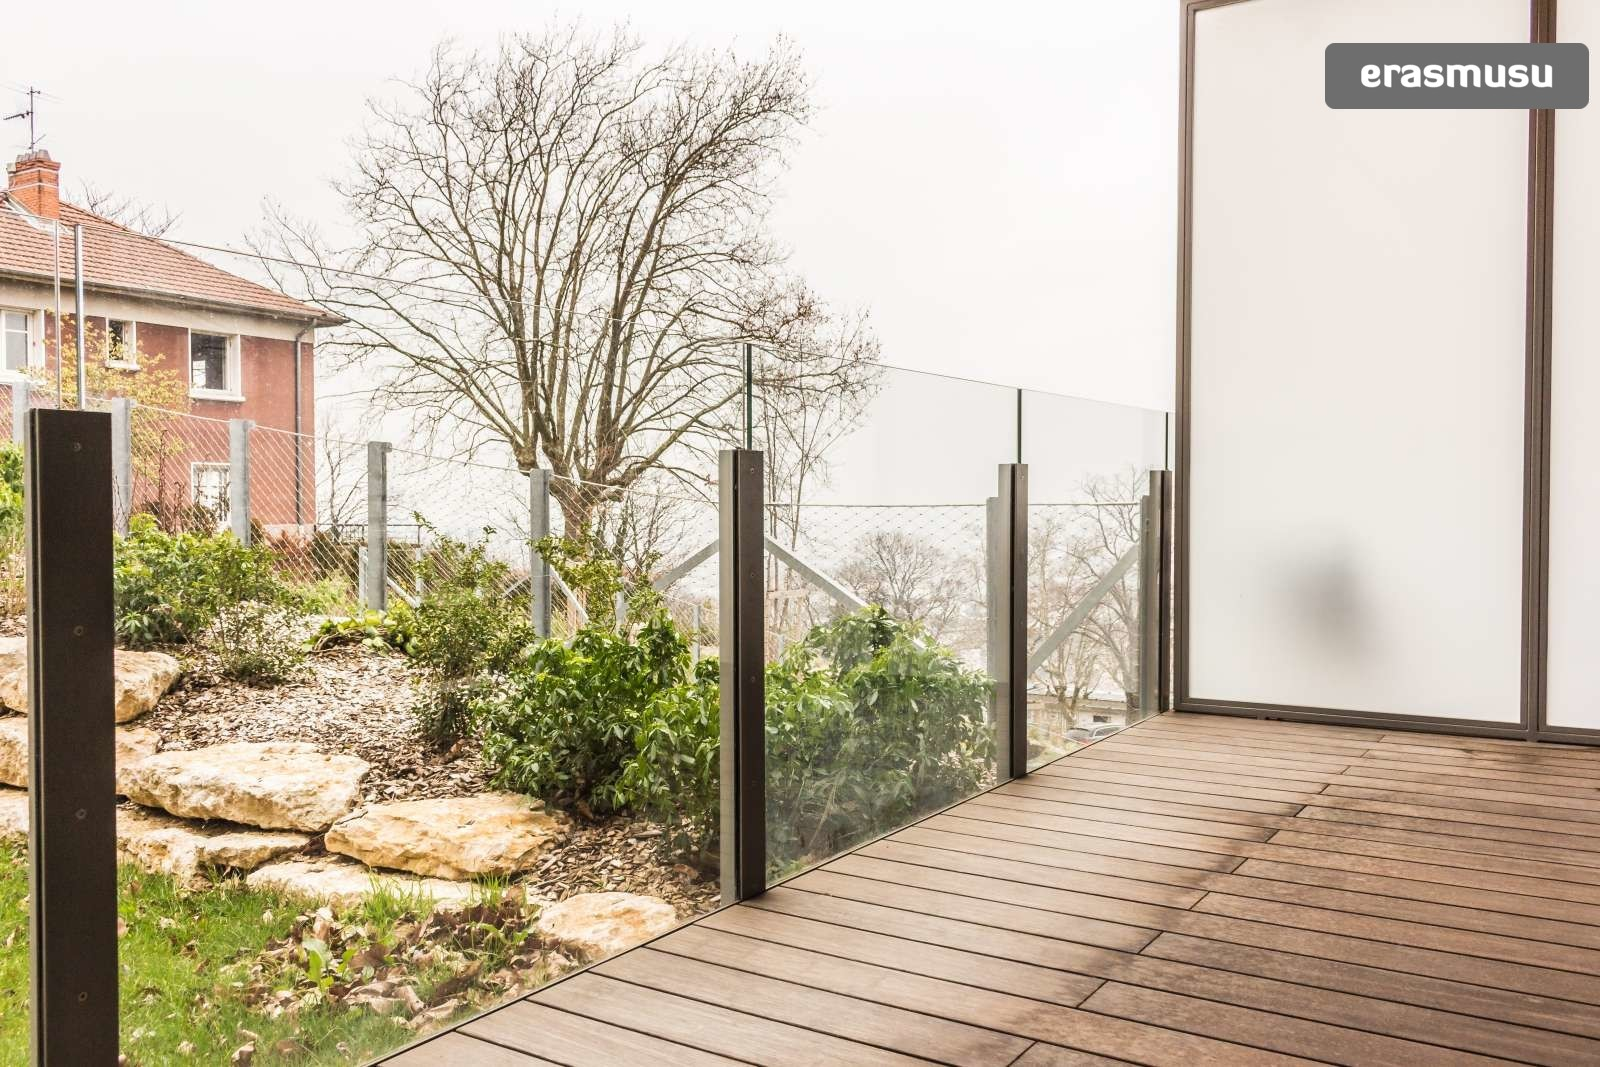 stylish-secure-studio-terrace-fourviere-hill-lyon-39ee18c6e980d8